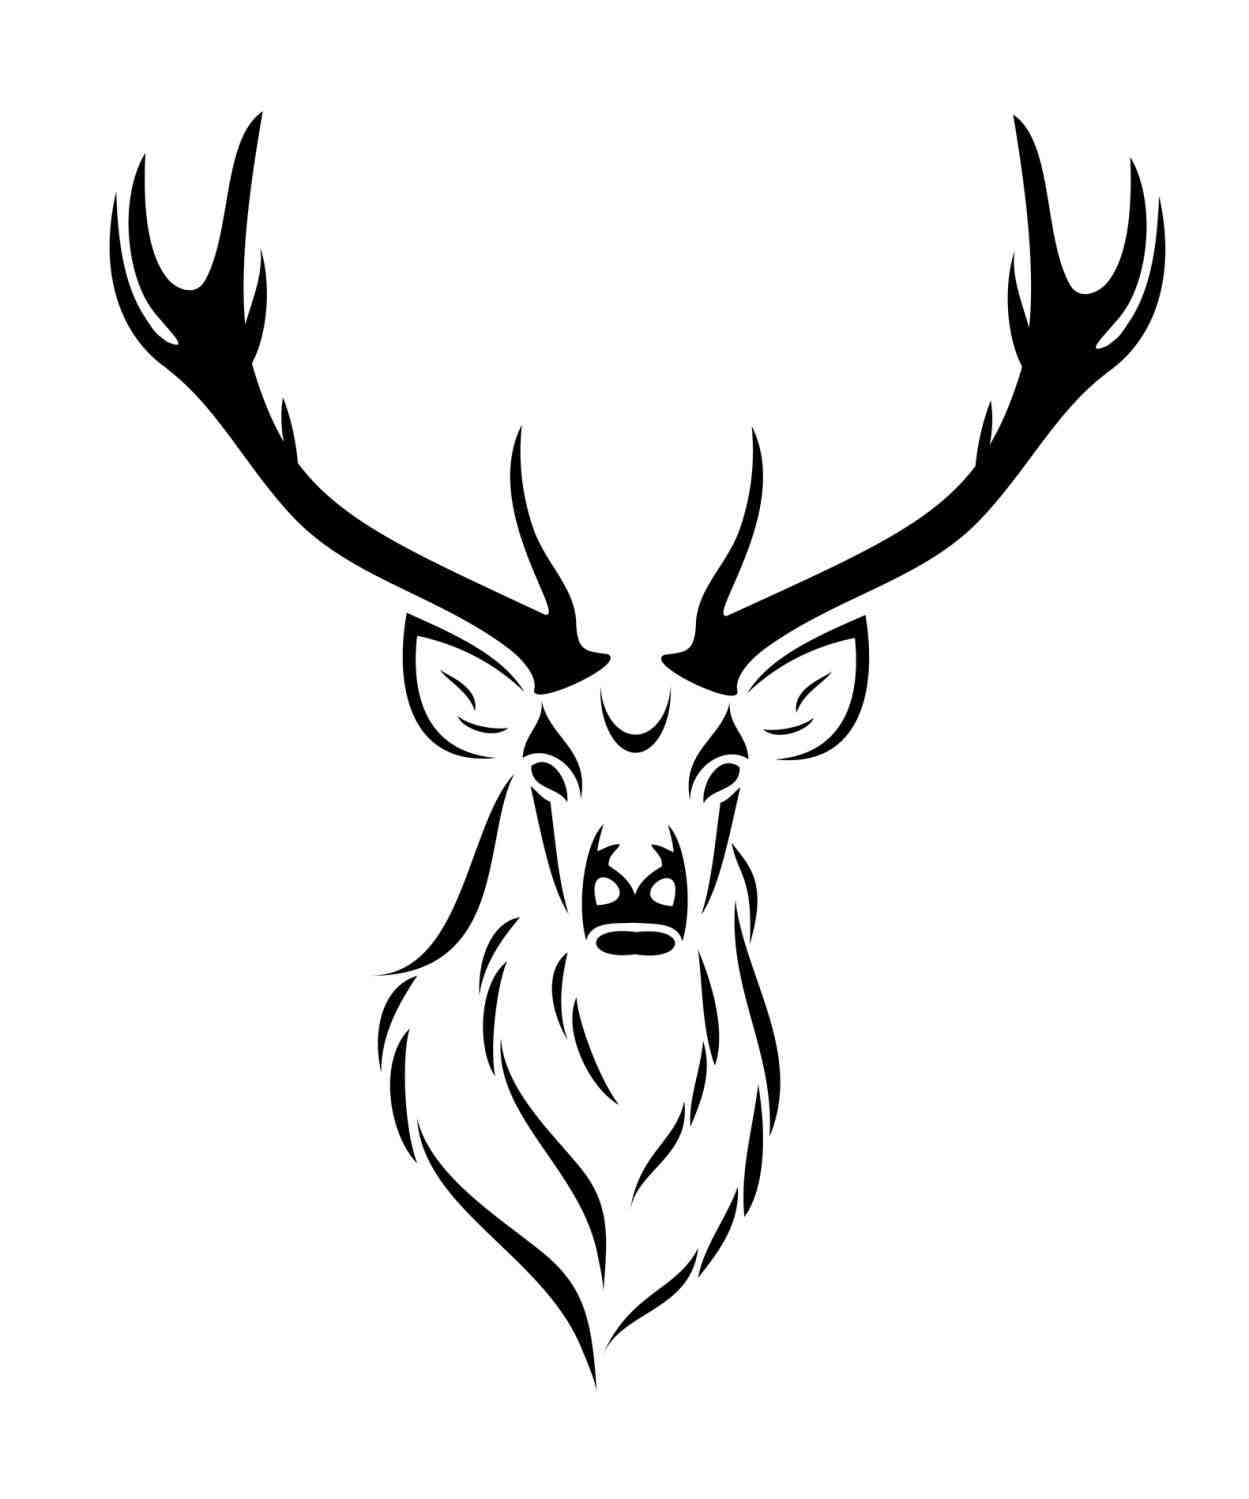 1249x1499 Deer Antler Drawing Moon Shed Deer Antler Drawing With Hand